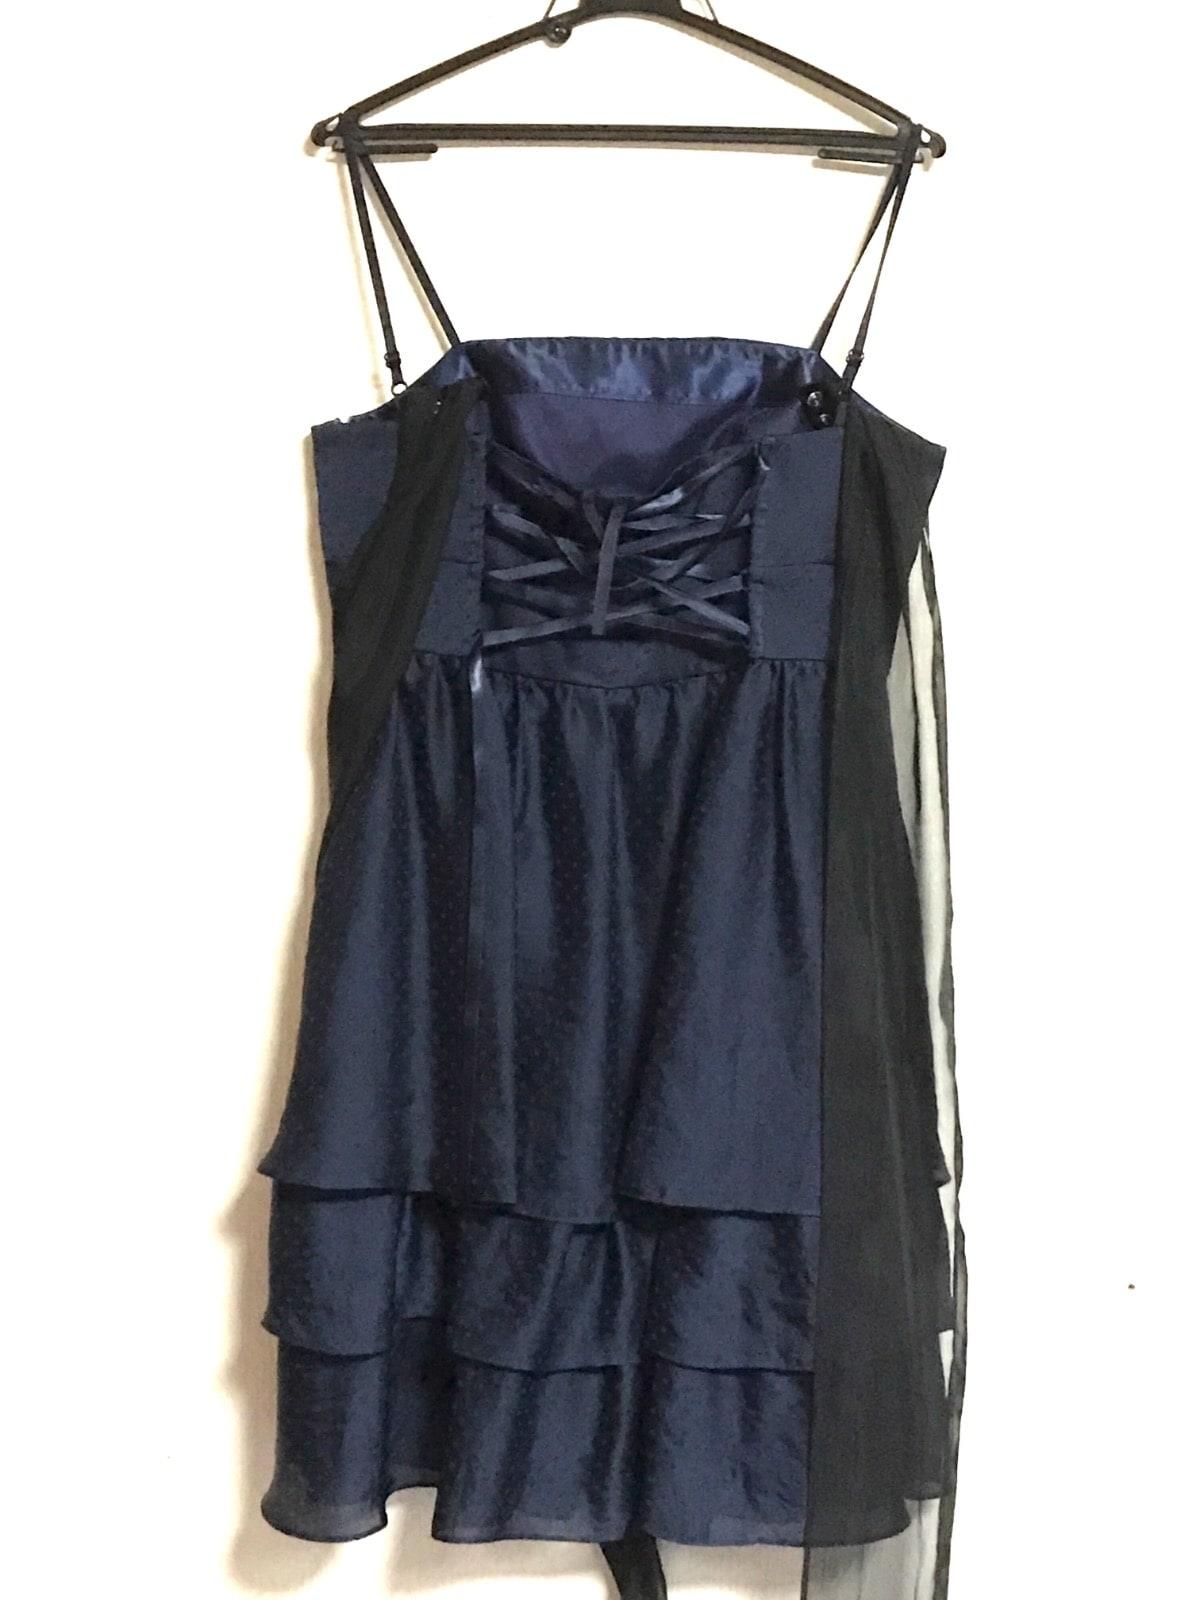 Queen Claret(クイーンクラレット)のドレス